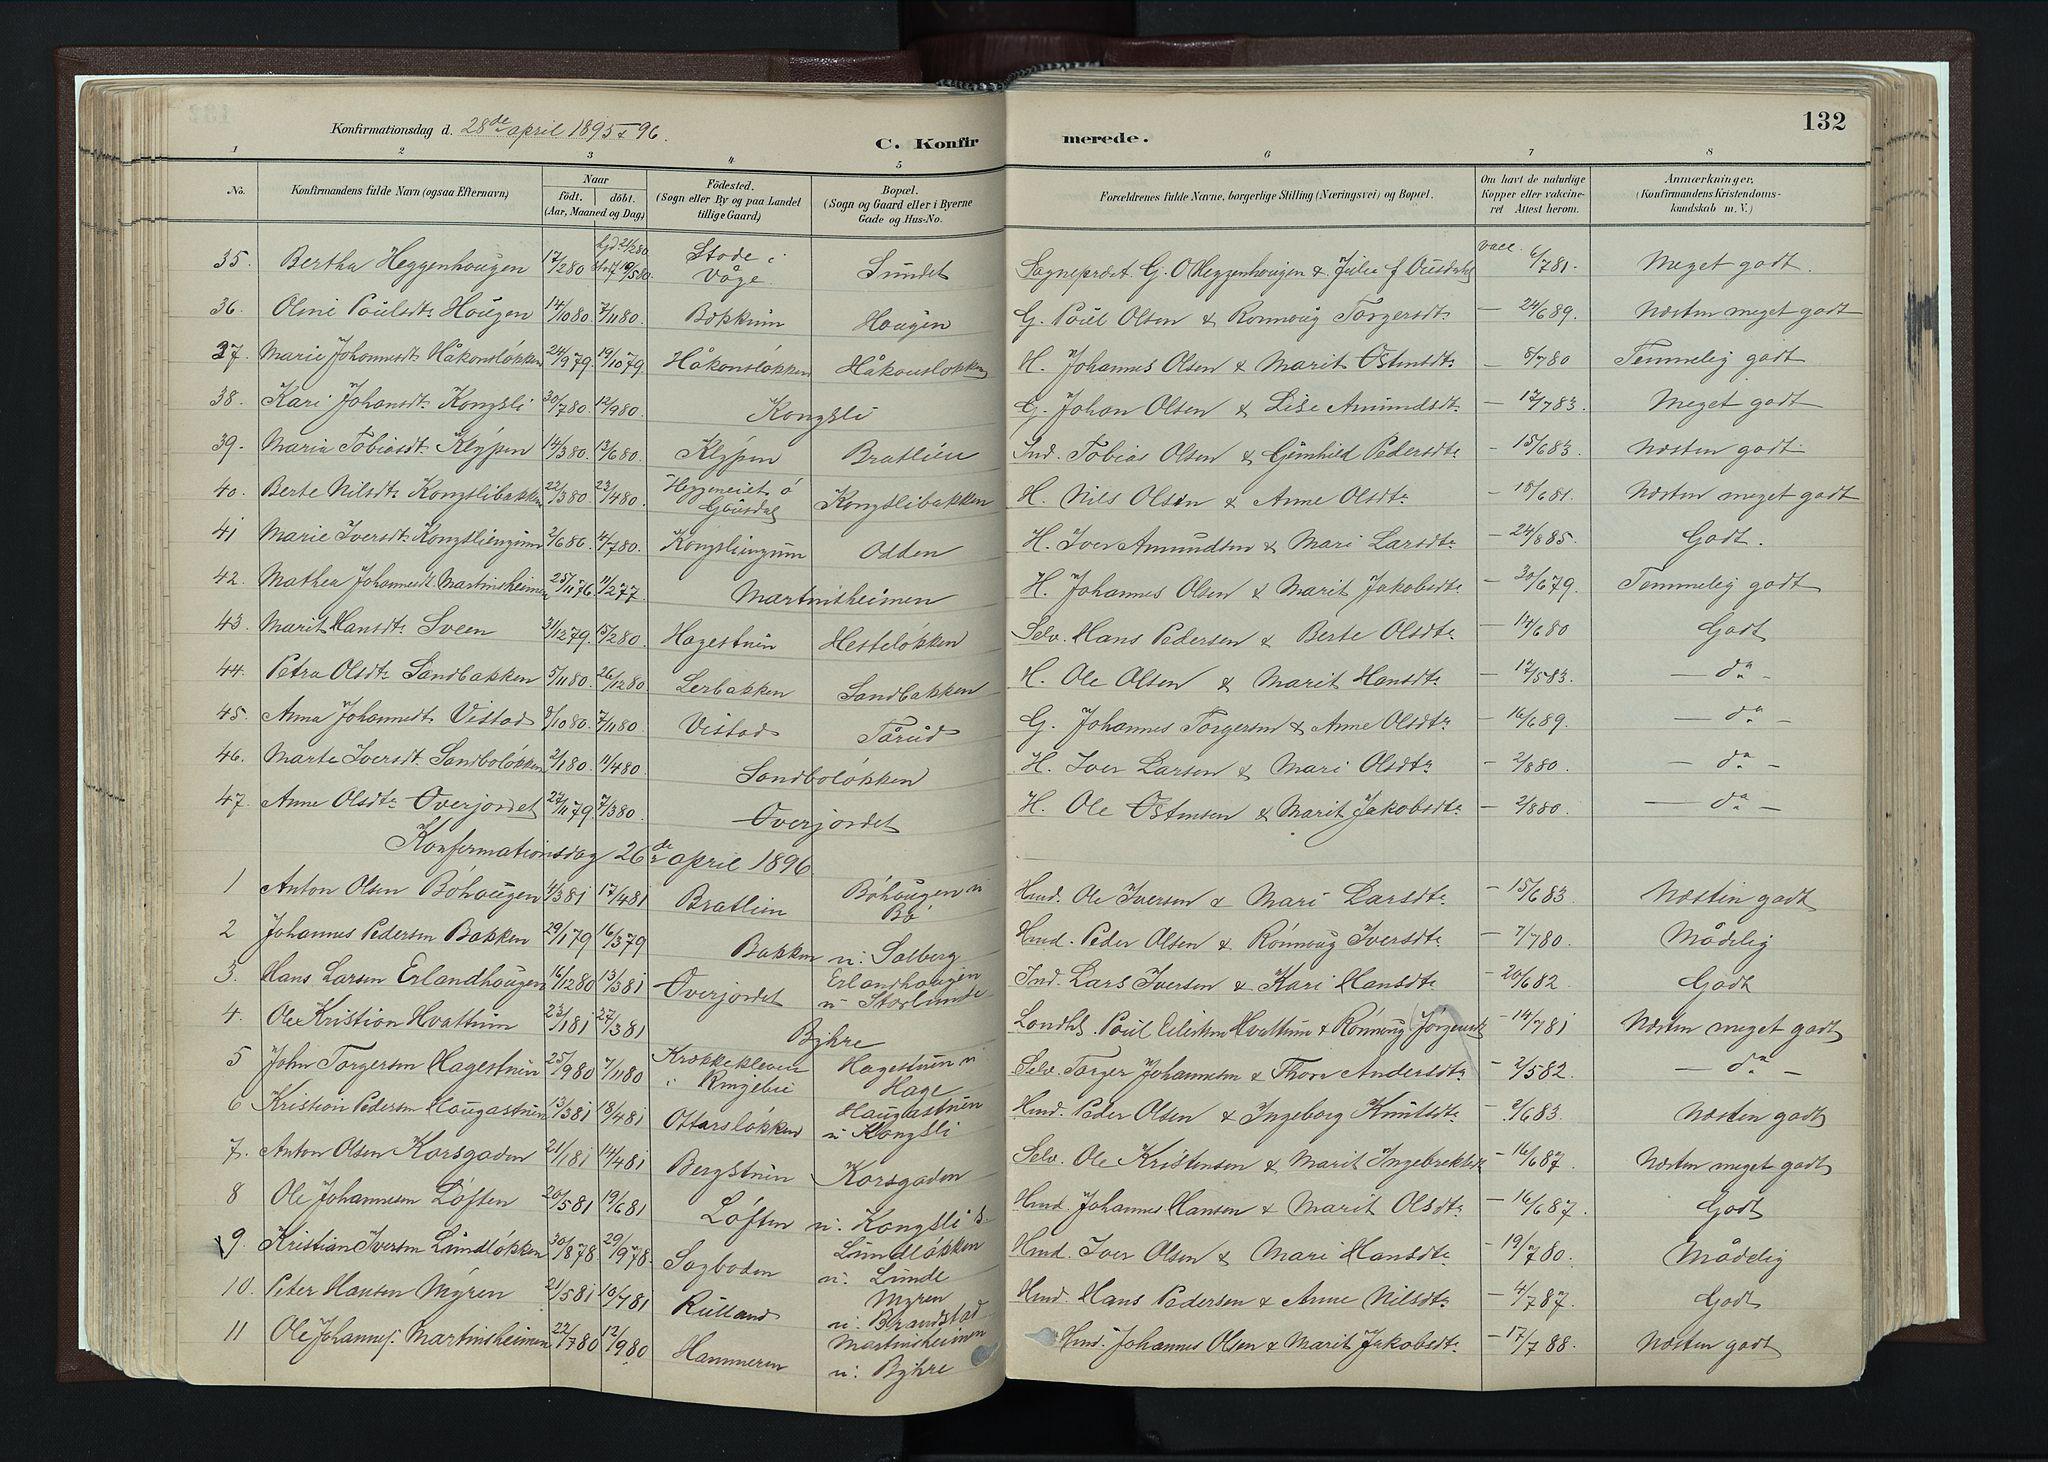 SAH, Nord-Fron prestekontor, Ministerialbok nr. 4, 1884-1914, s. 132